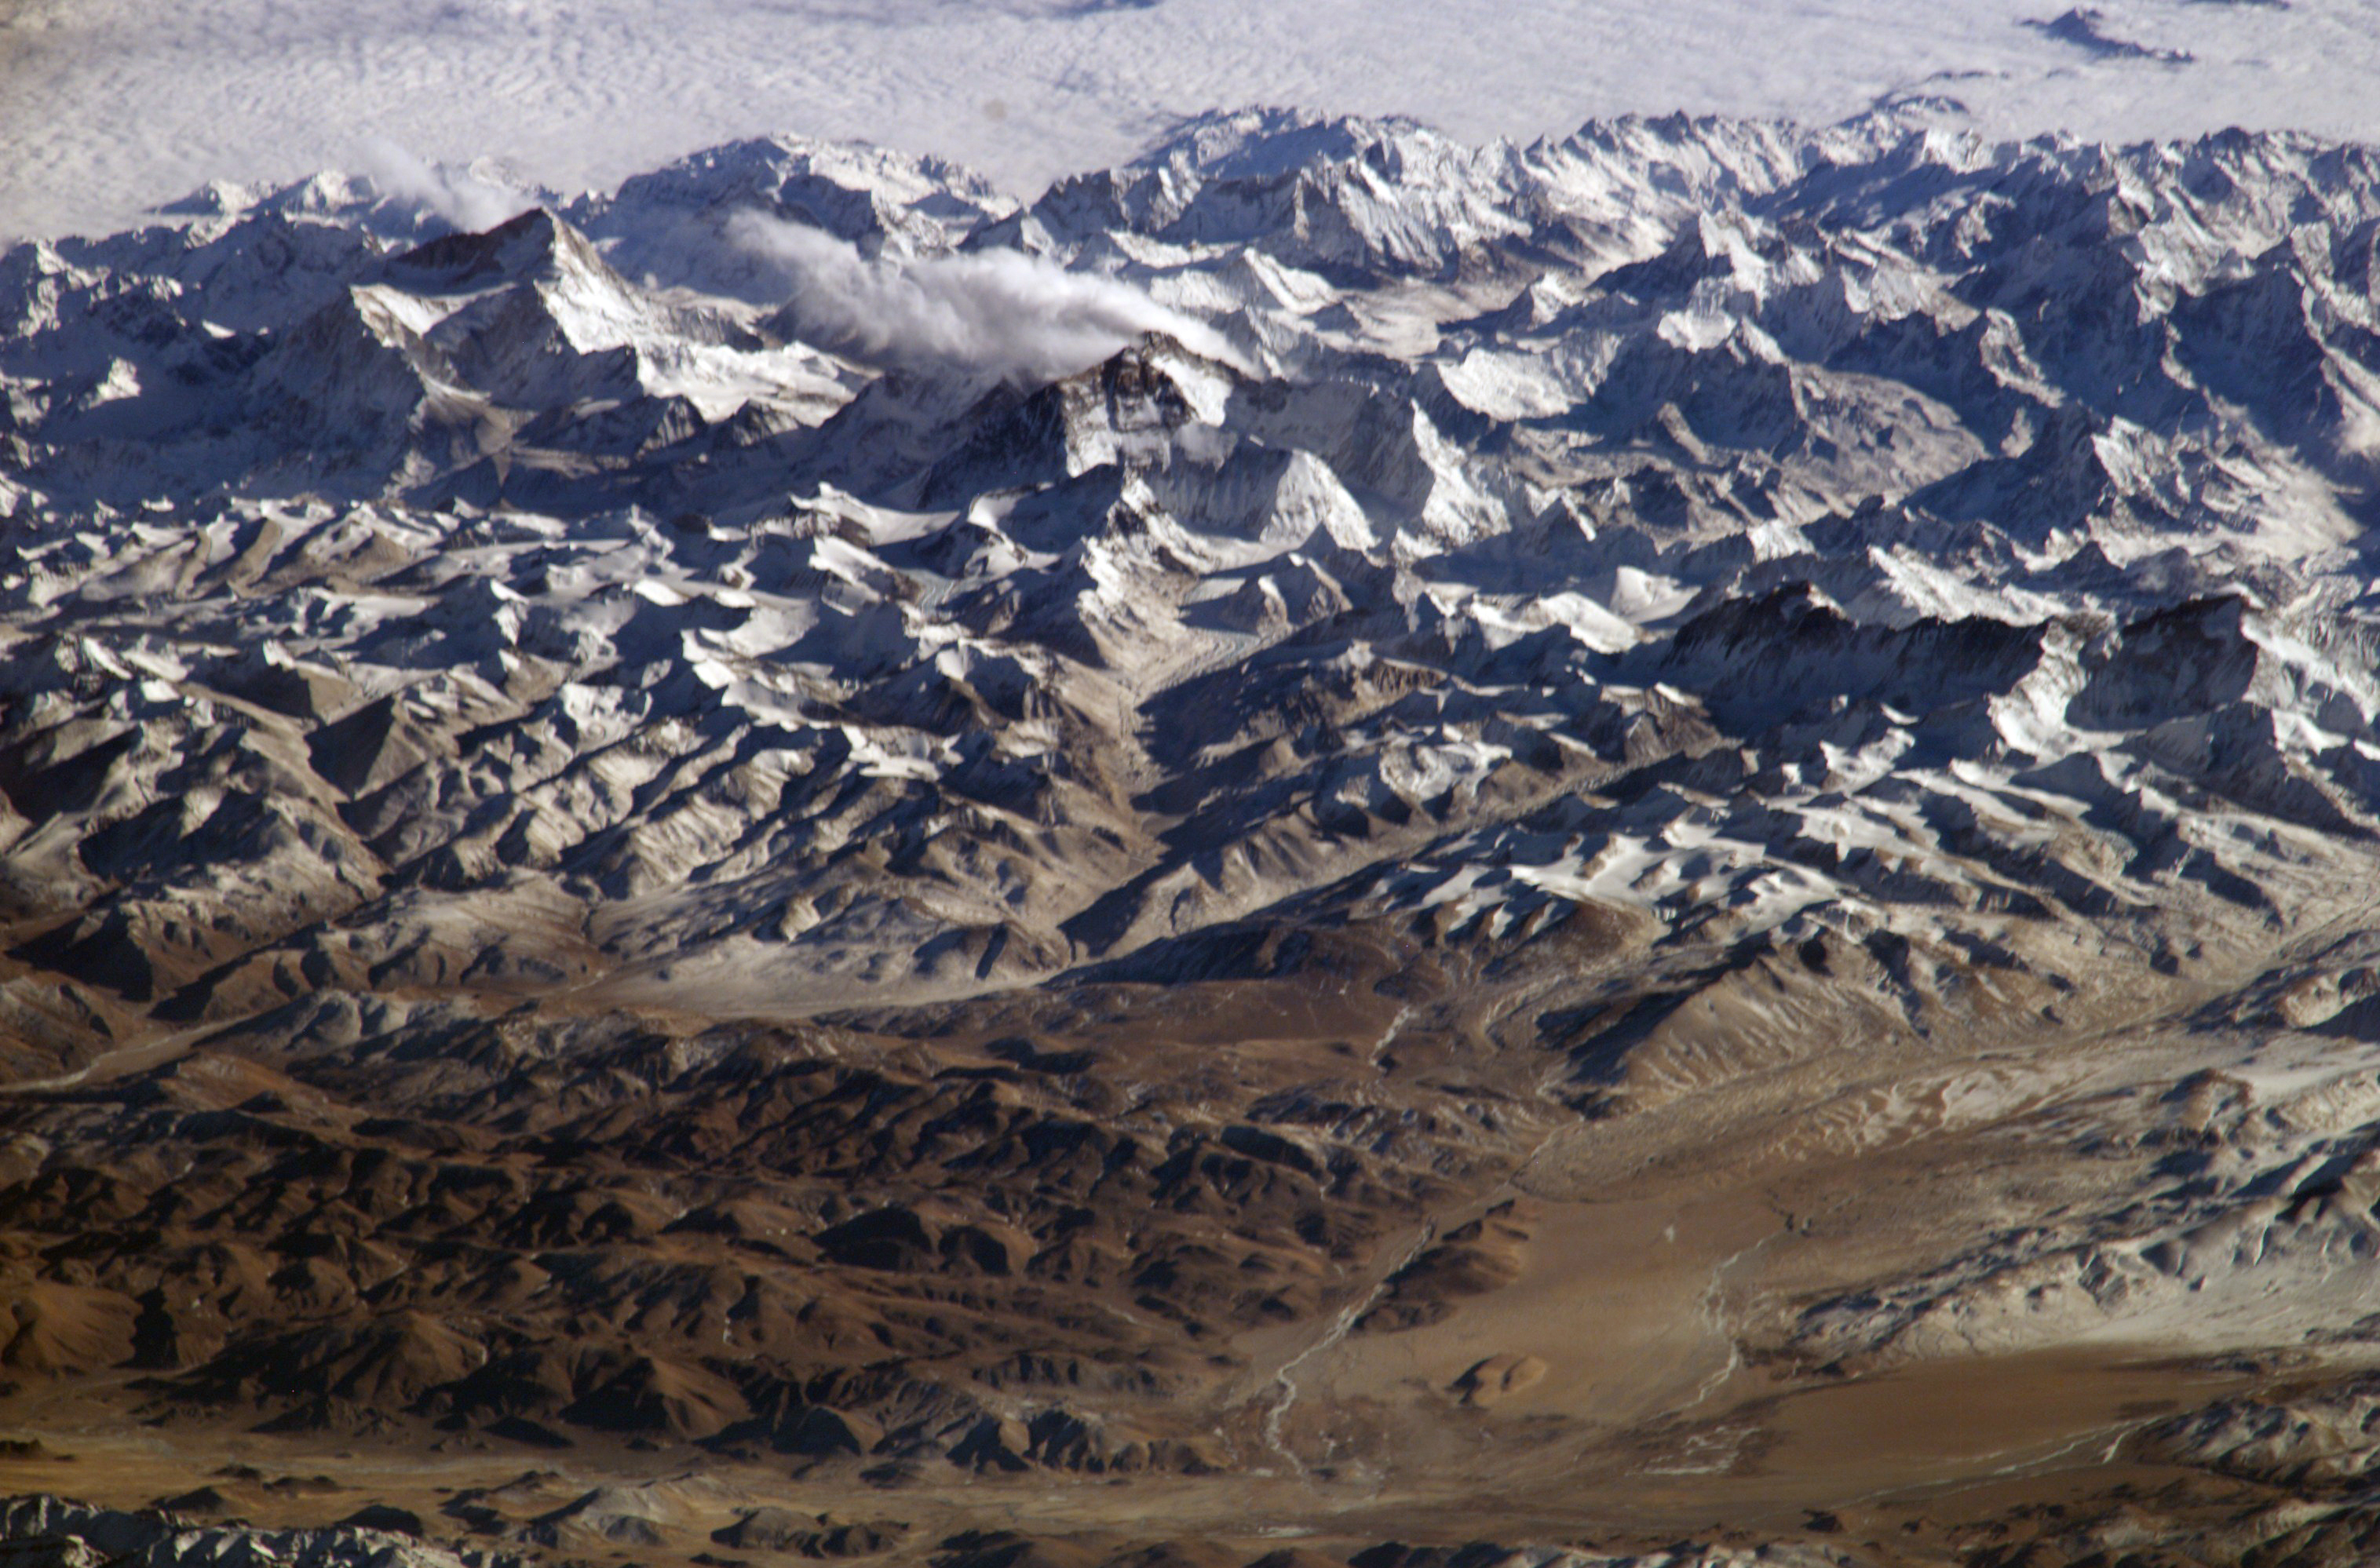 Cordilheira do himalaia geologia infoescola cordilheira do himalaia fandeluxe Choice Image